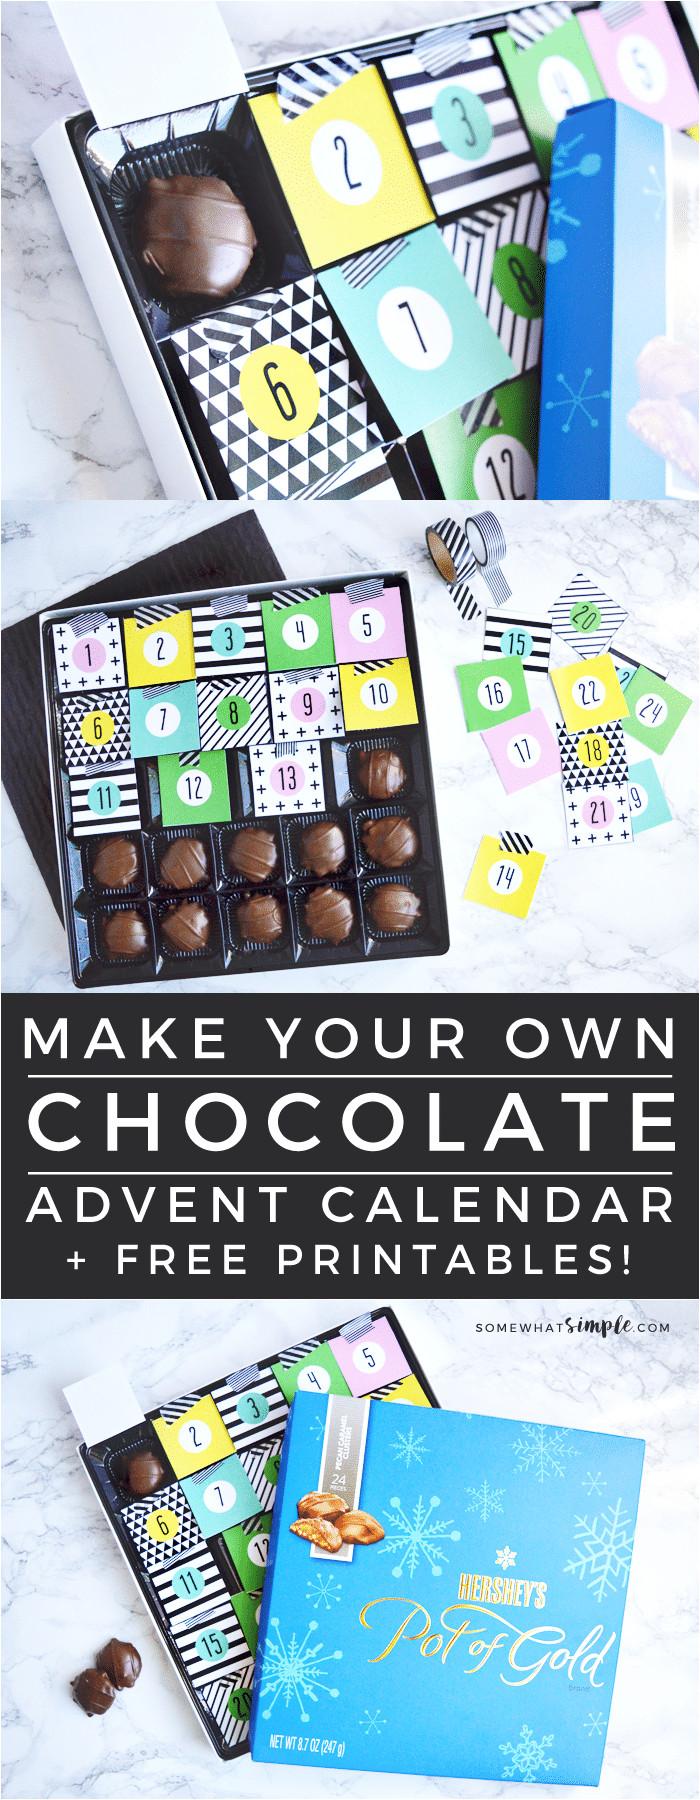 Make Your Own Advent Calendar Template Diy Chocolate Christmas Advent Calendar Free Printables